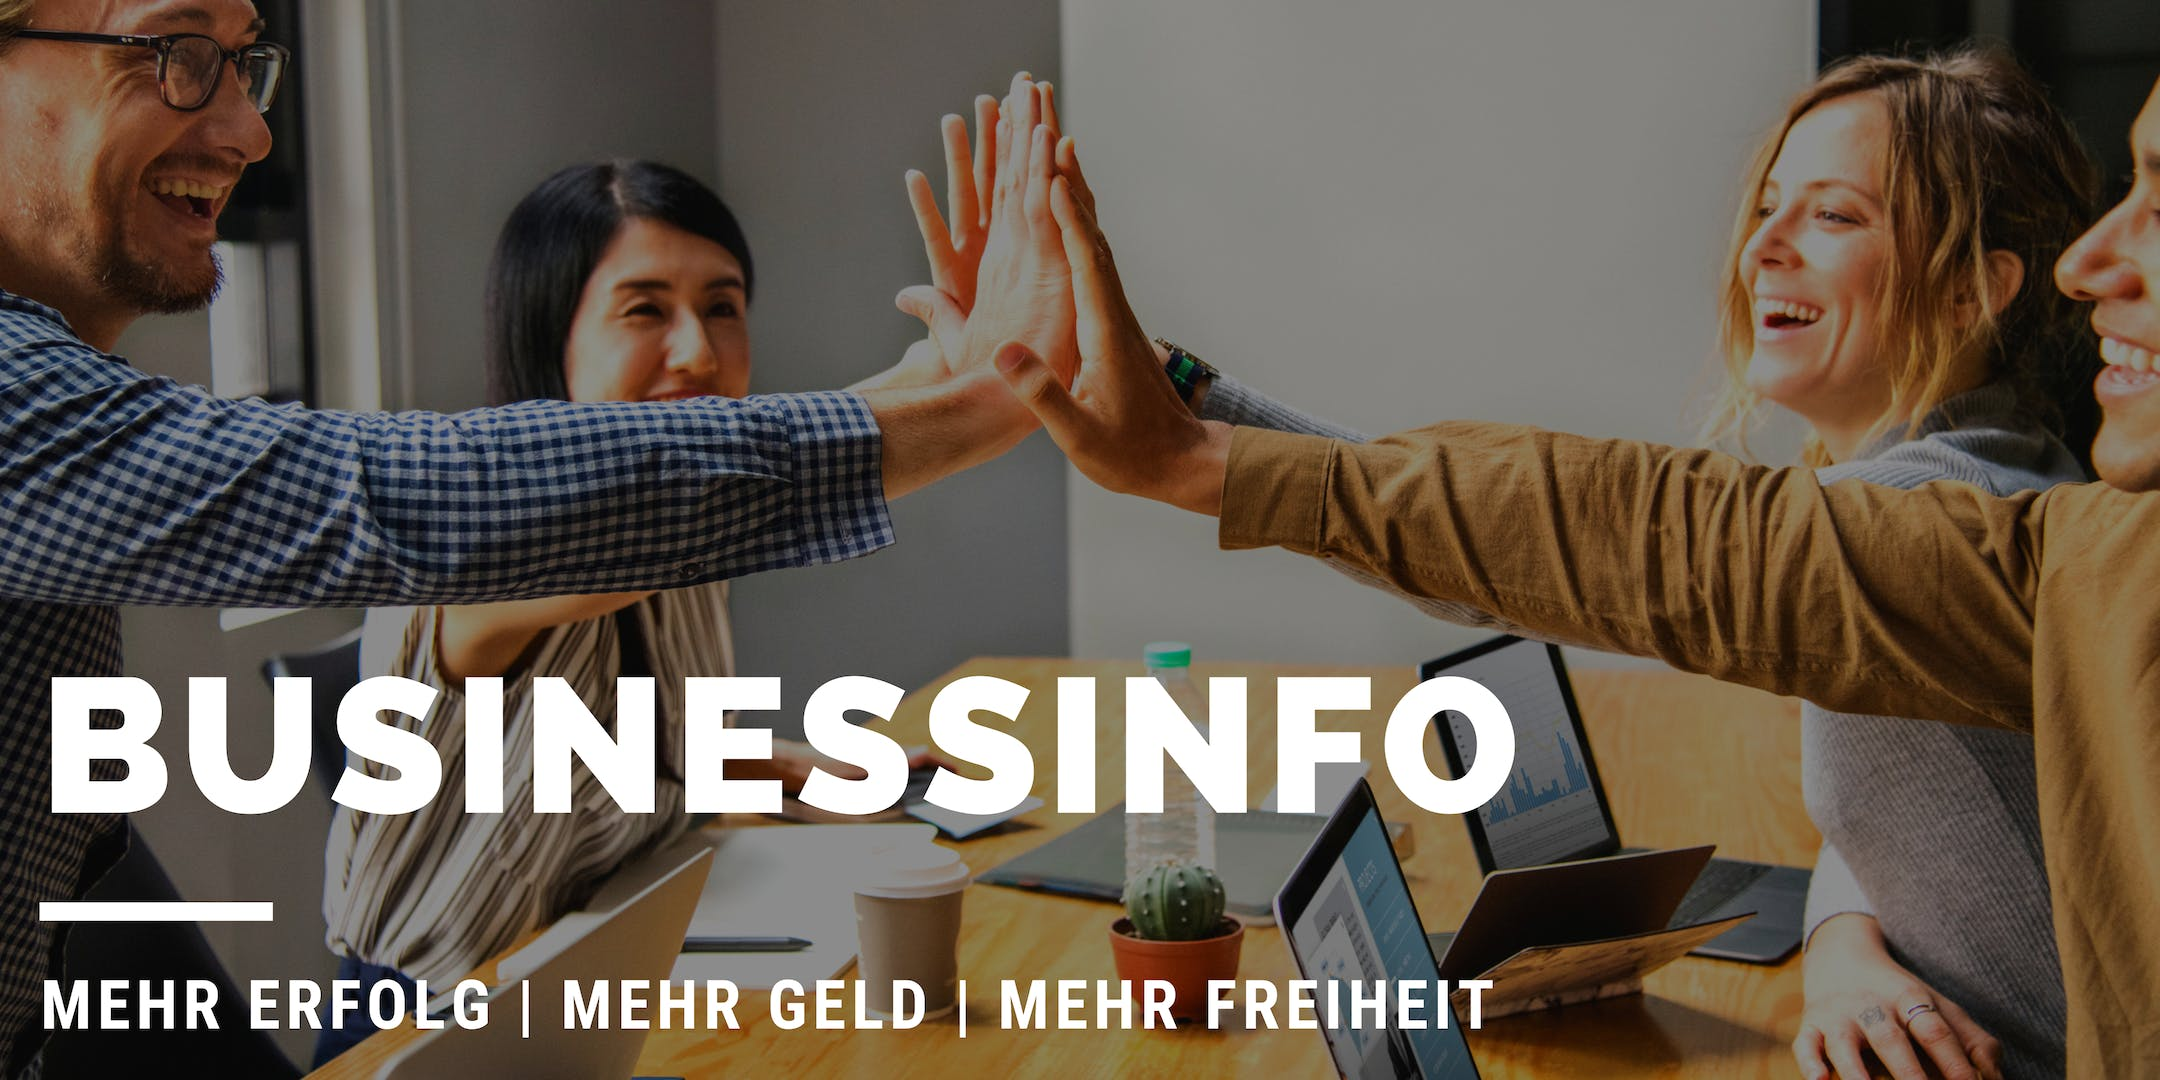 Businessinfo - Dein perfektes Business!